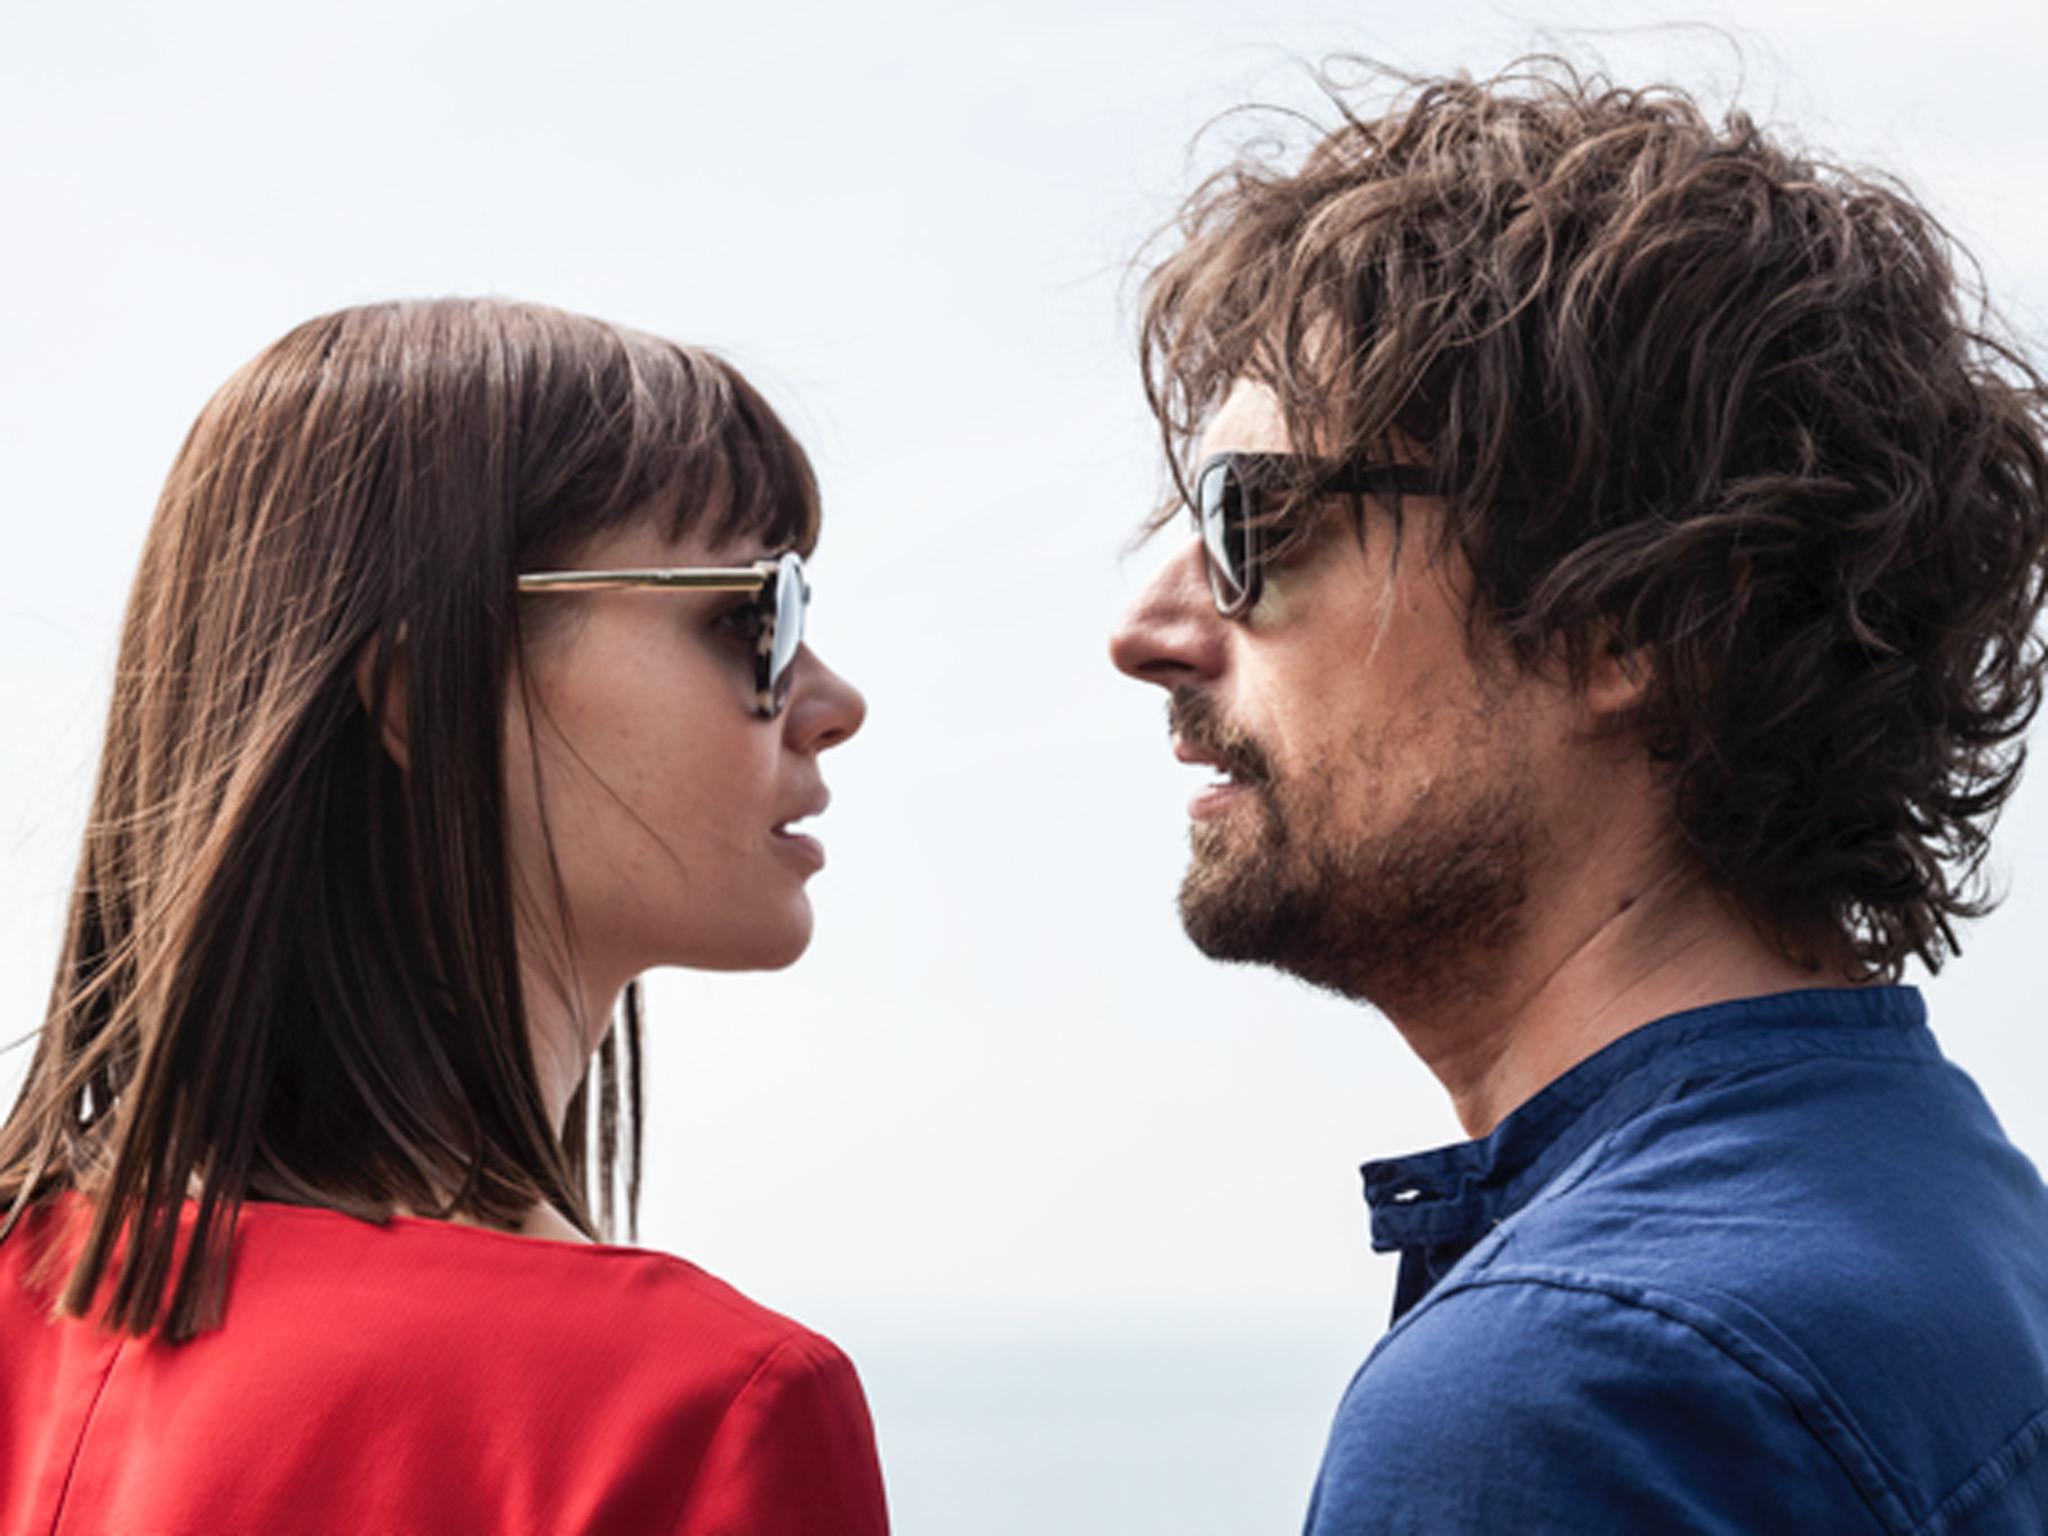 Australian-Italian co-production The Space Between